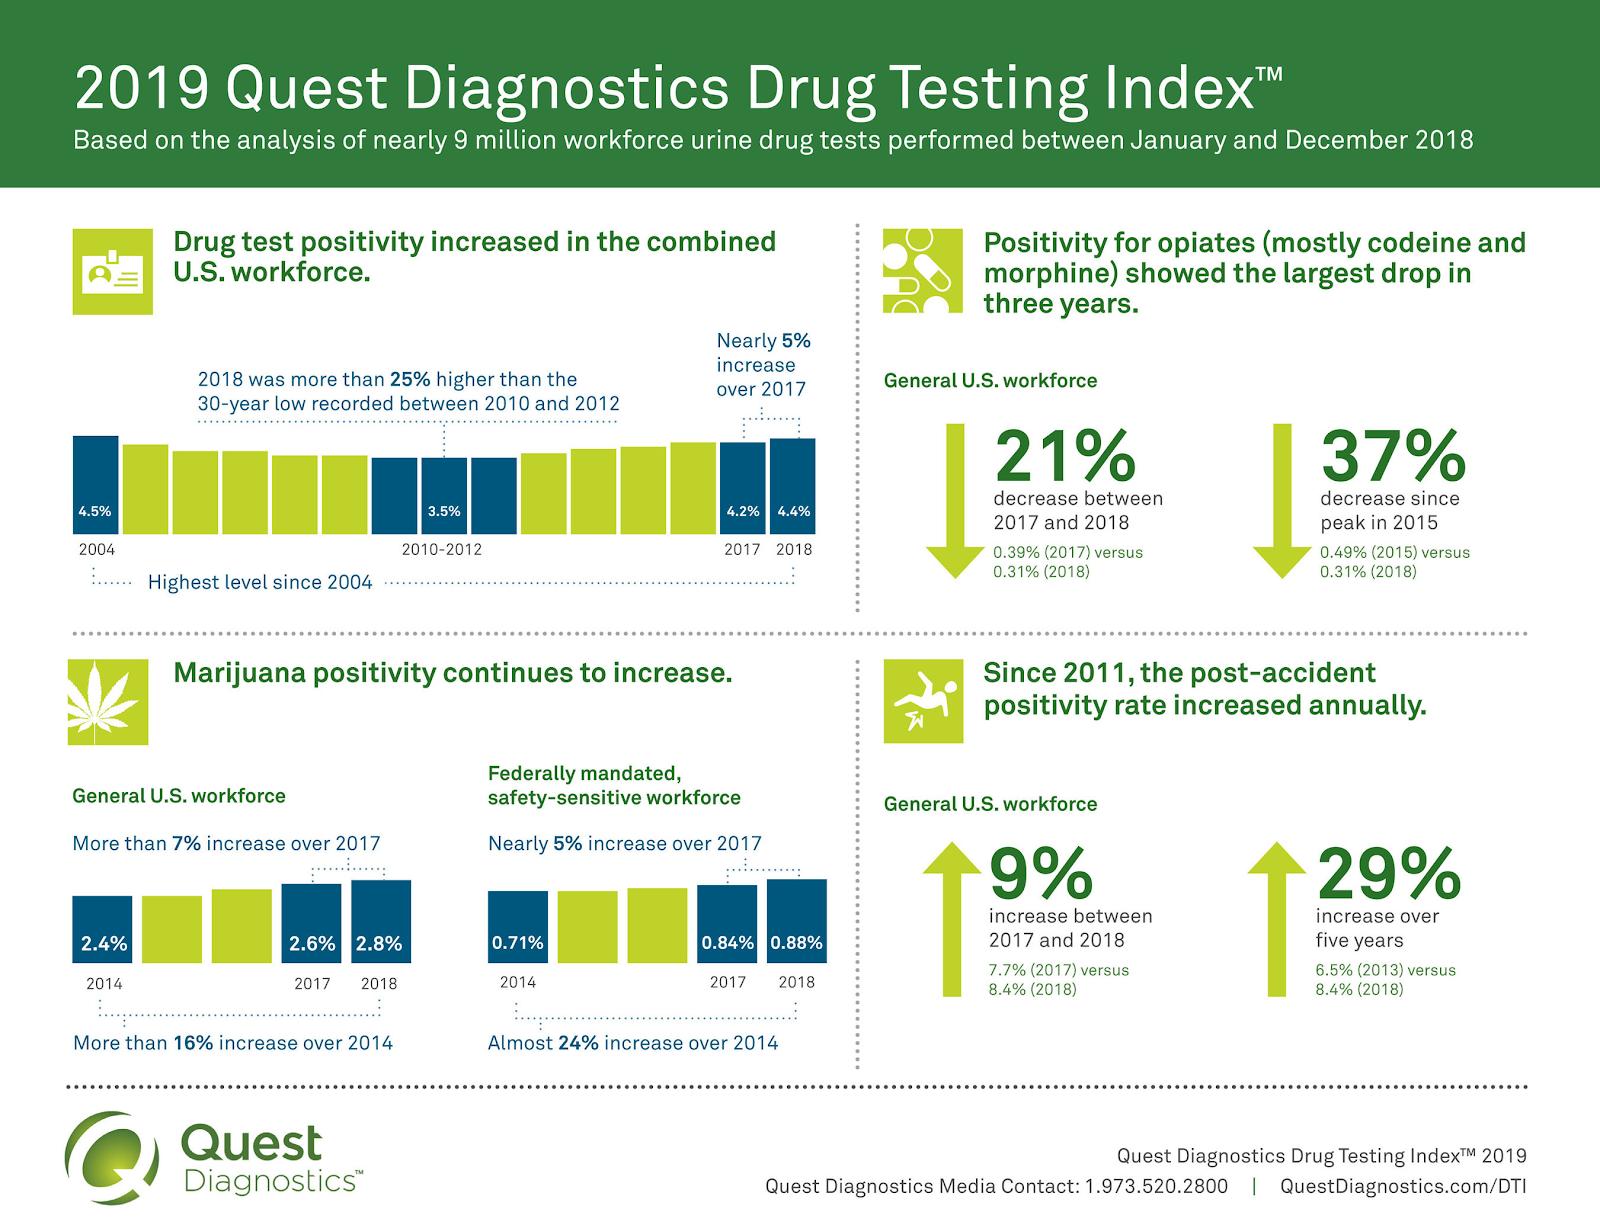 2019 Quest Diagnostics Drug Testing Index